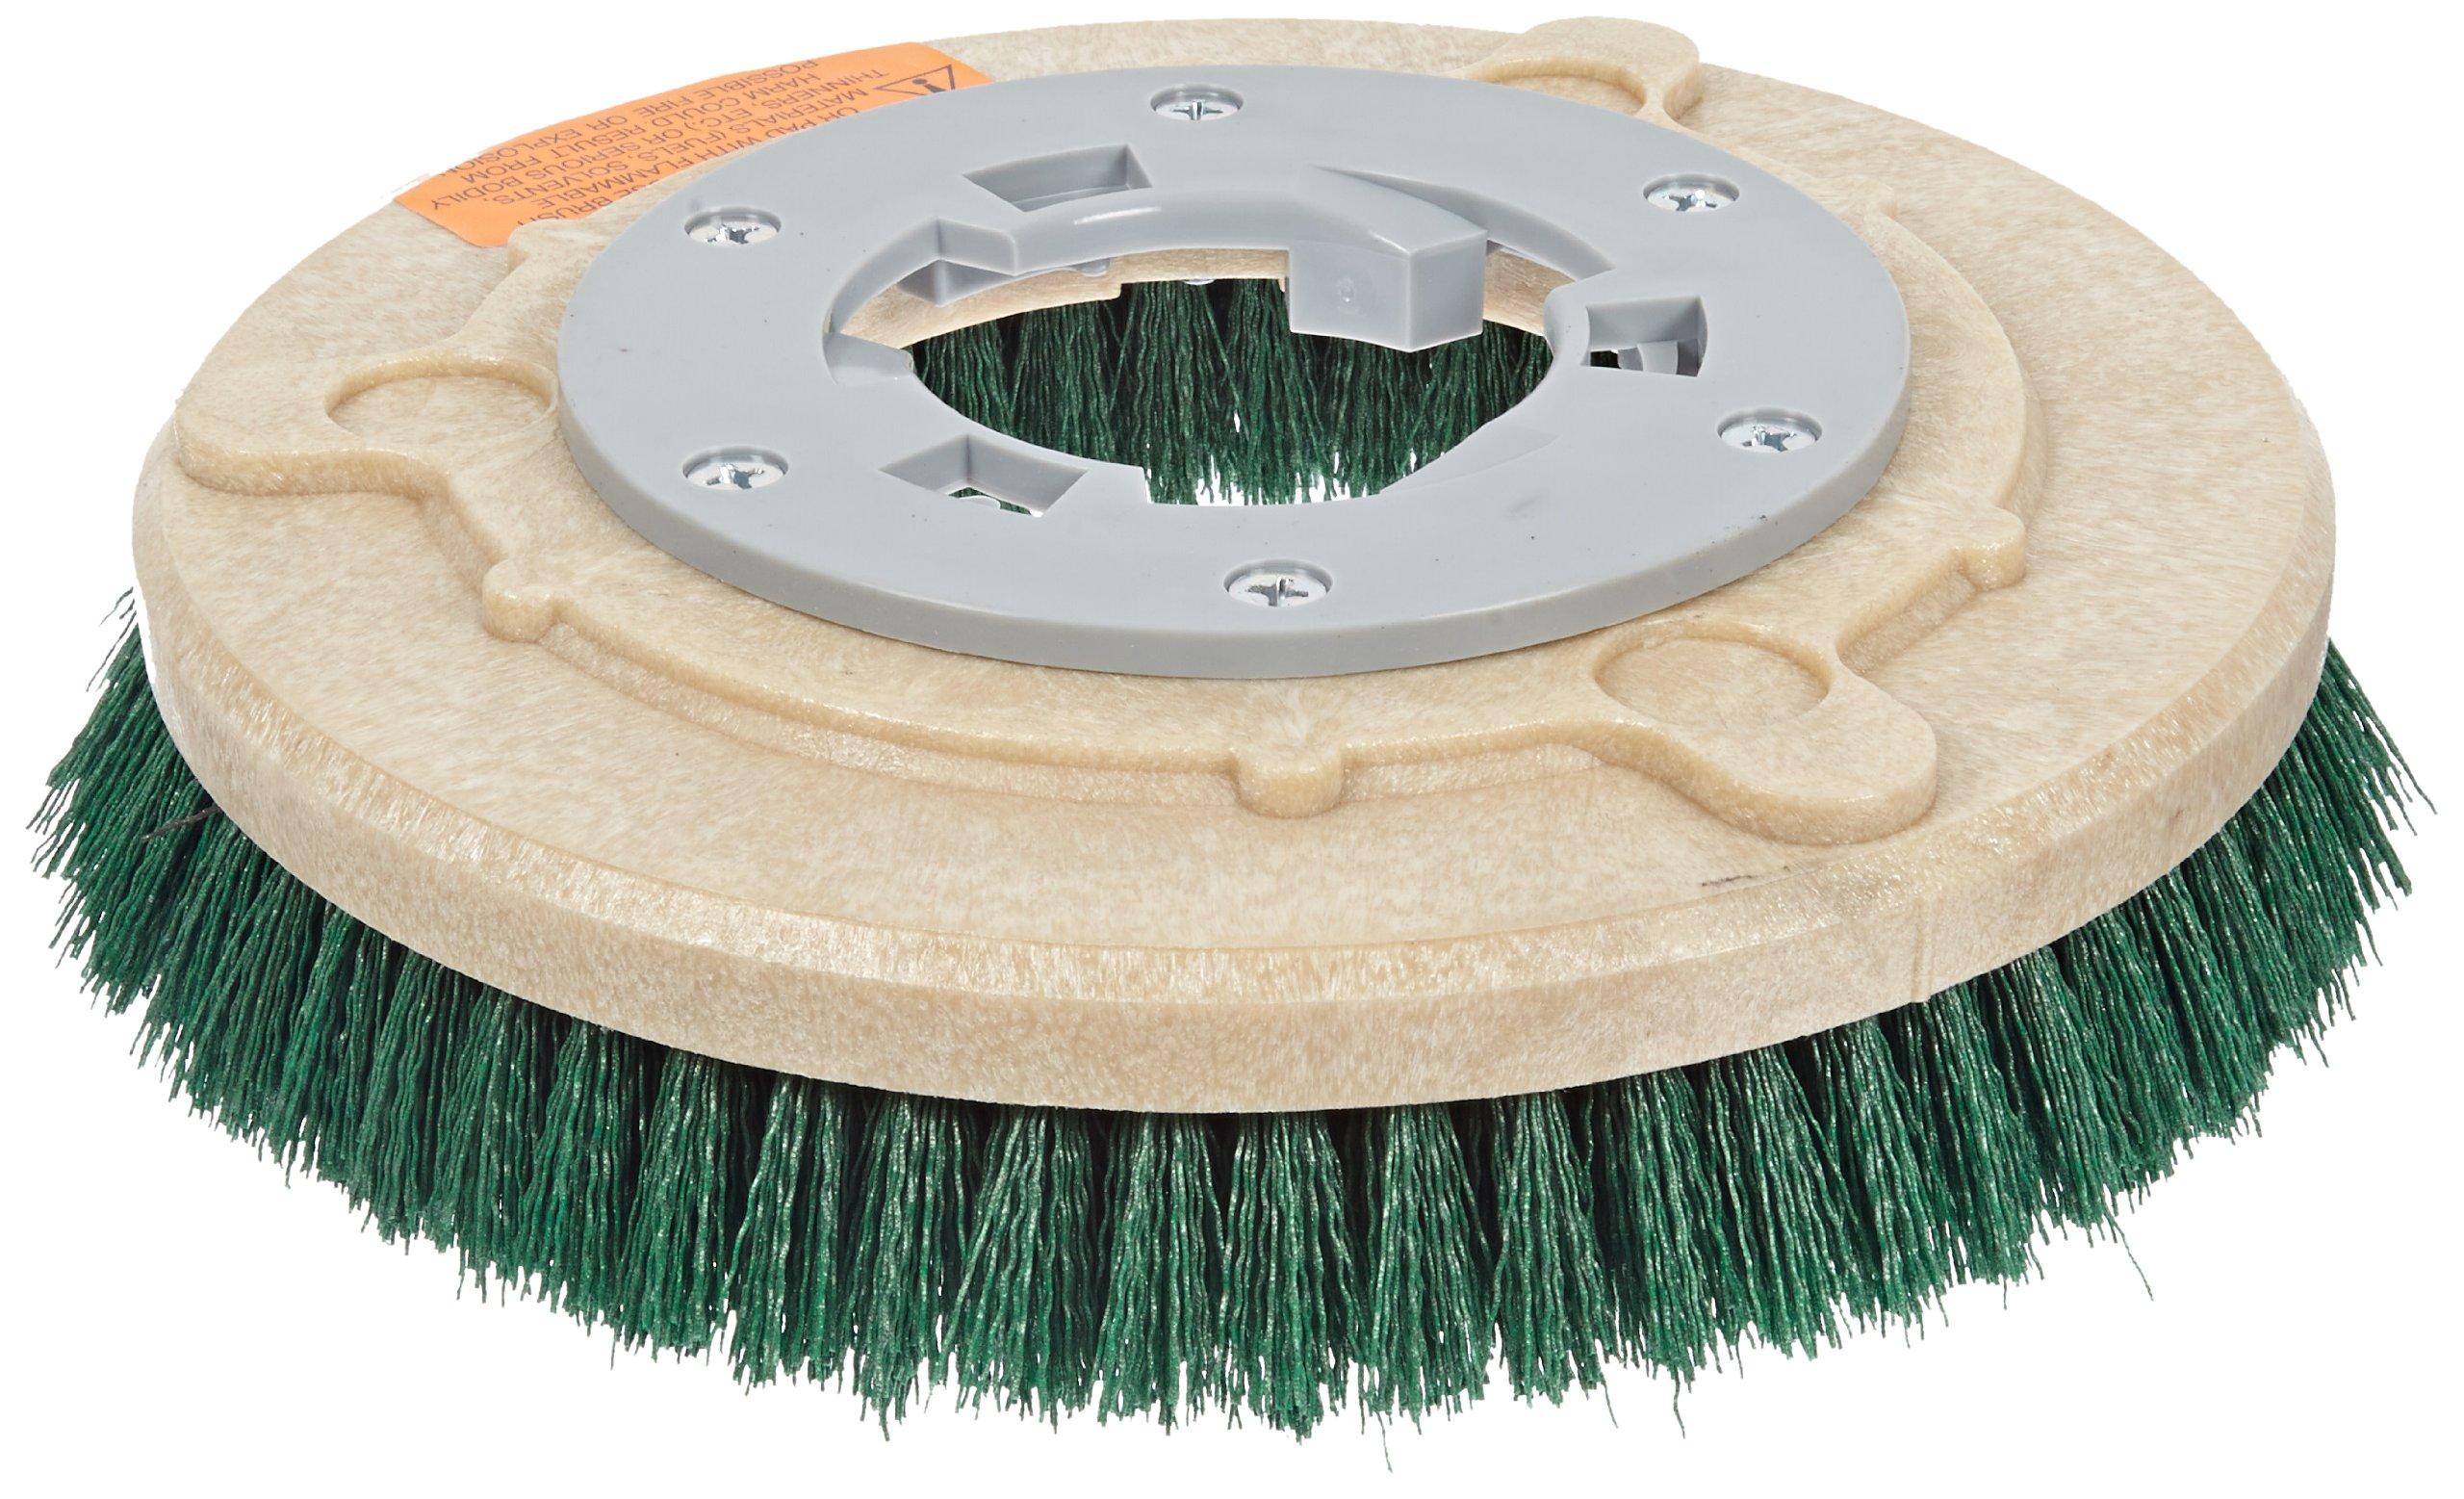 Qleeno 813011 Mal-Grit General Scrubbing Brush with Clutch Plate